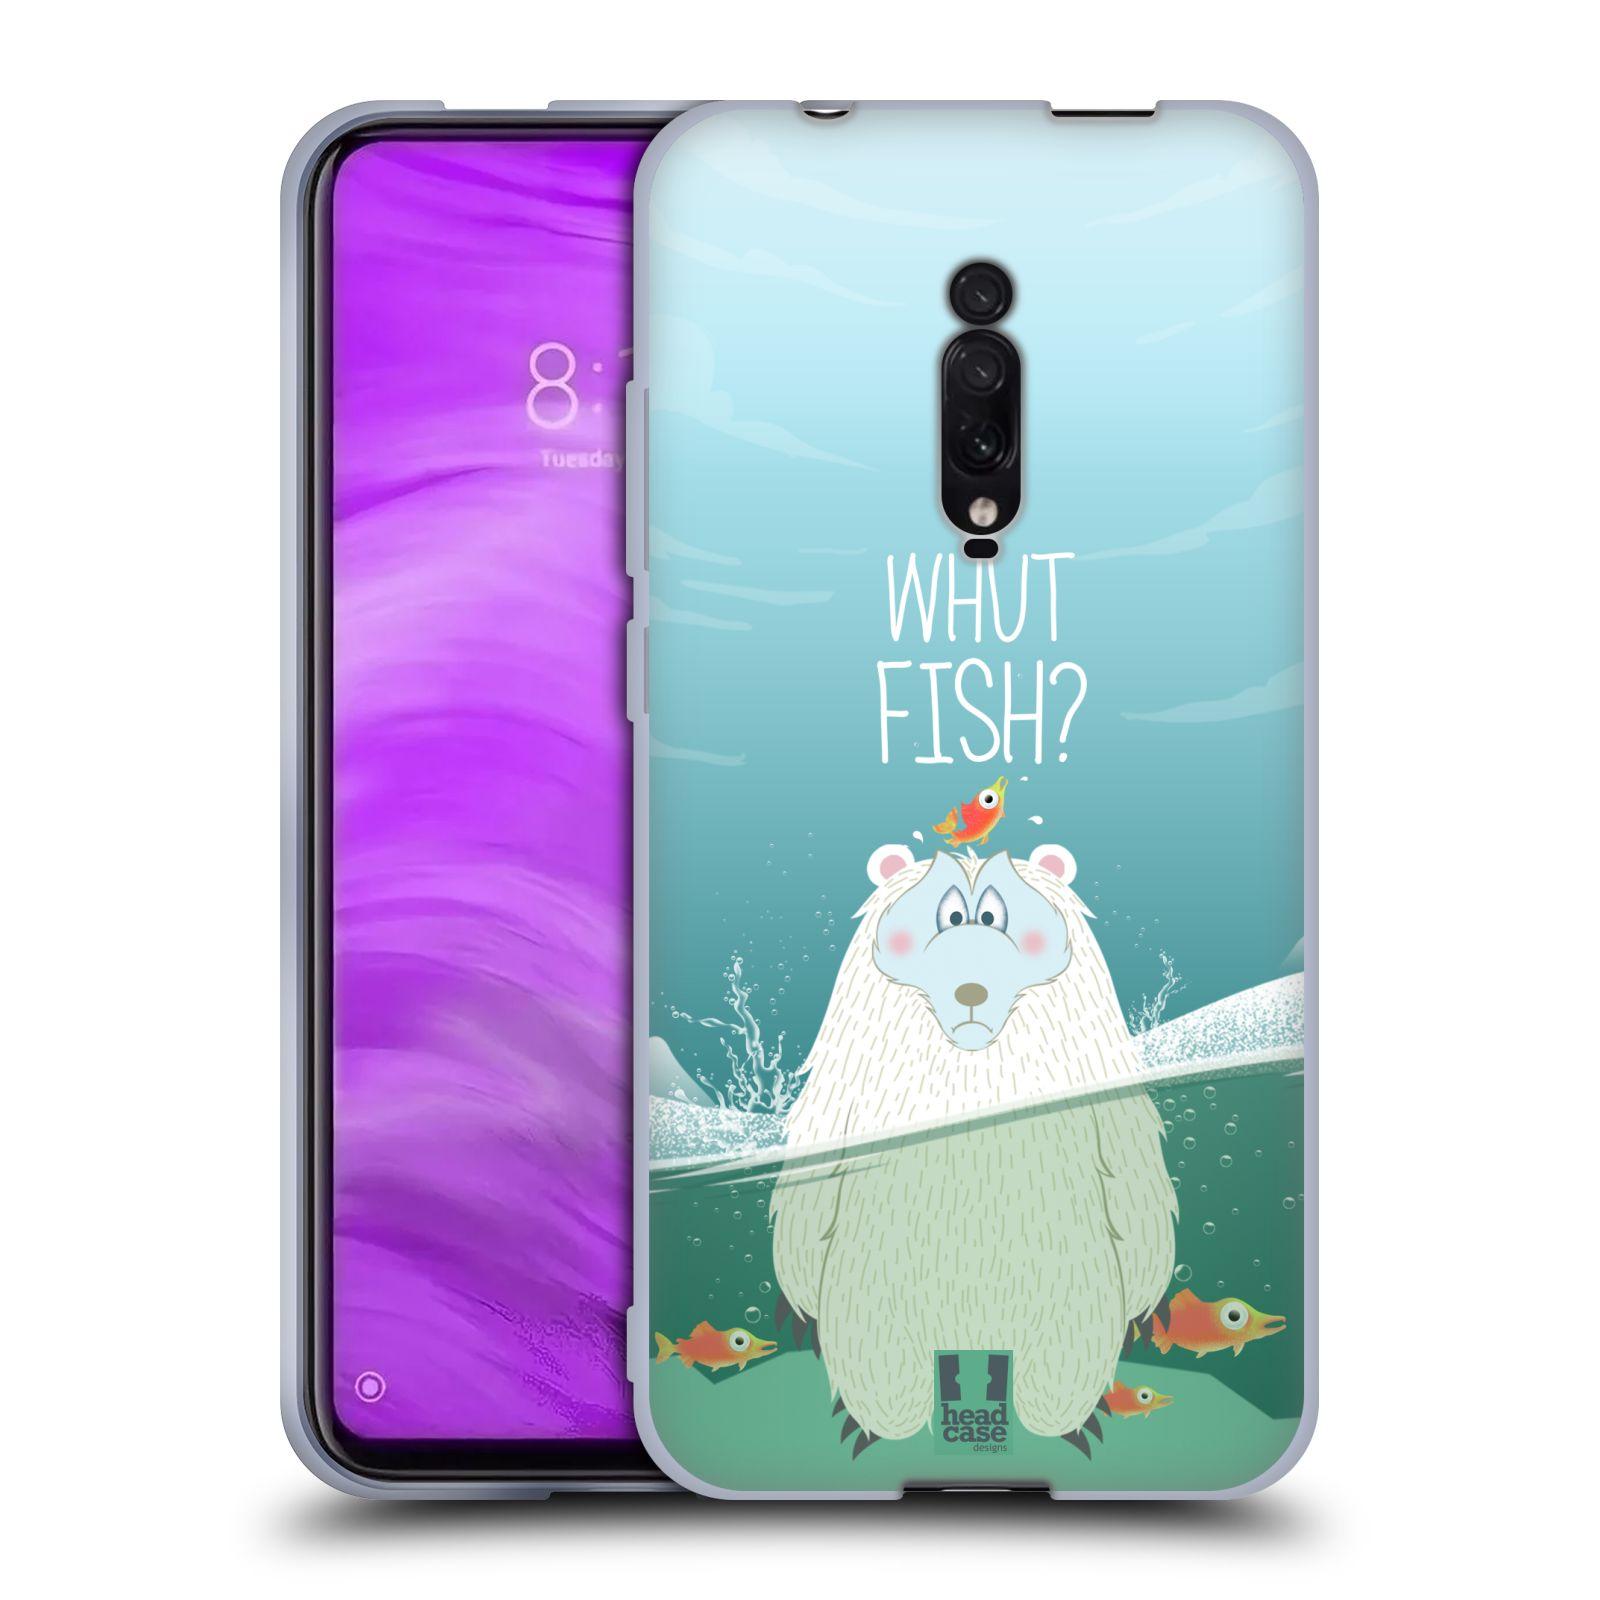 Silikonové pouzdro na mobil Xiaomi Mi 9T - Head Case - Medvěd Whut Fish?